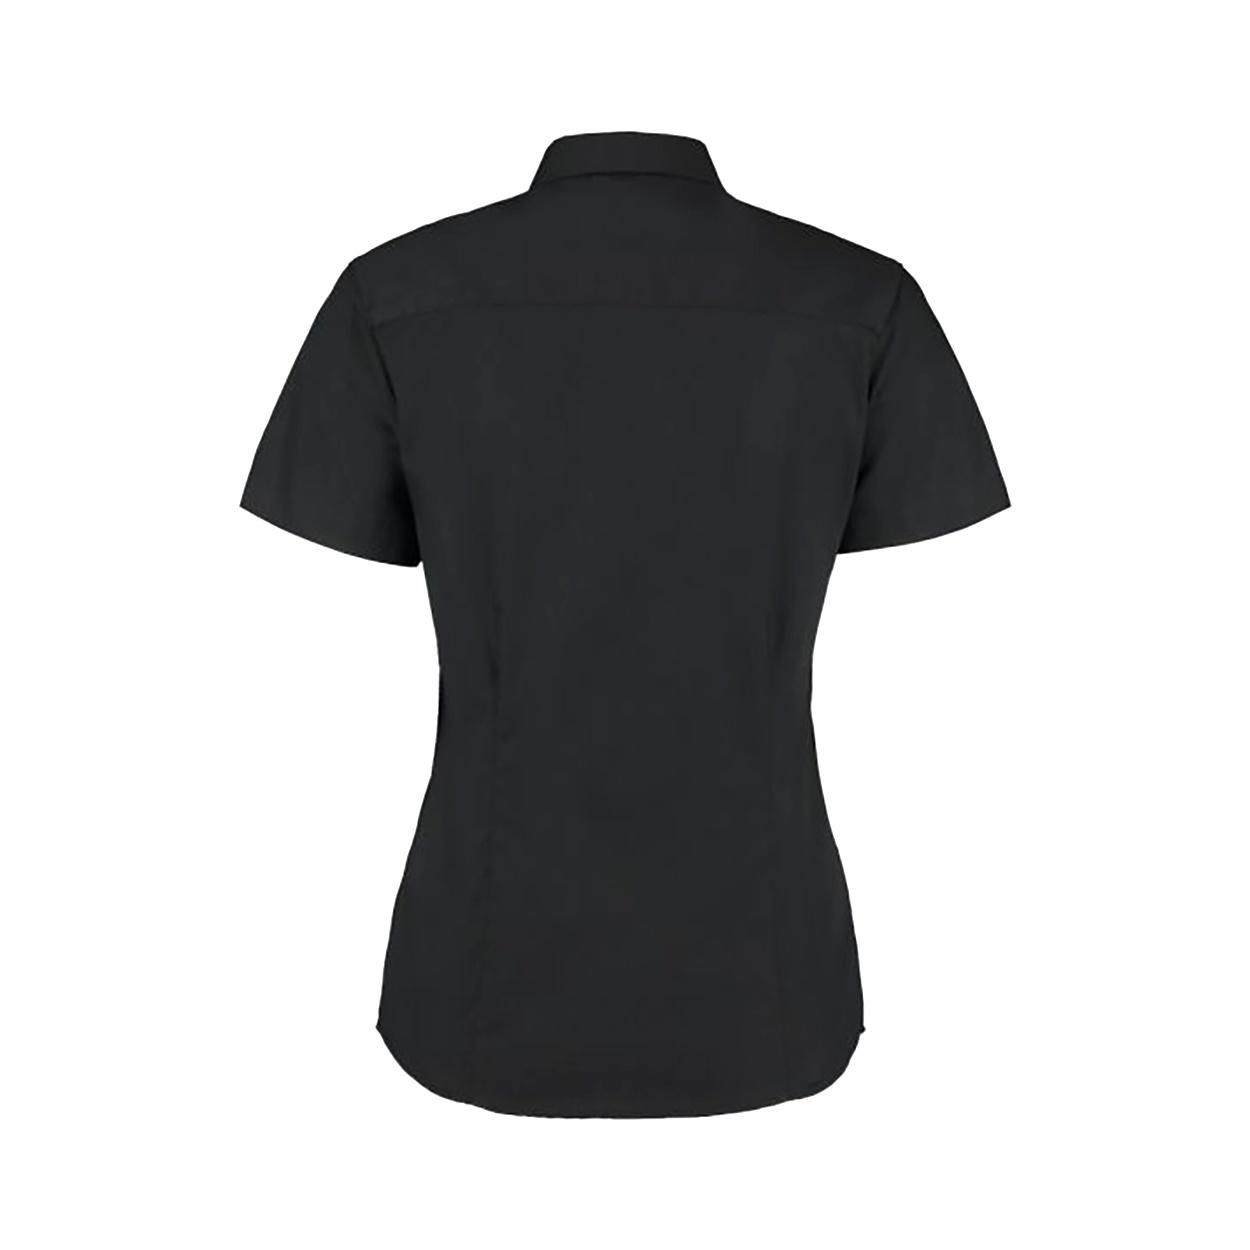 Kustom Kit Ladies Corporate Oxford Short Sleeve Shirt (28) (Midnight Navy)